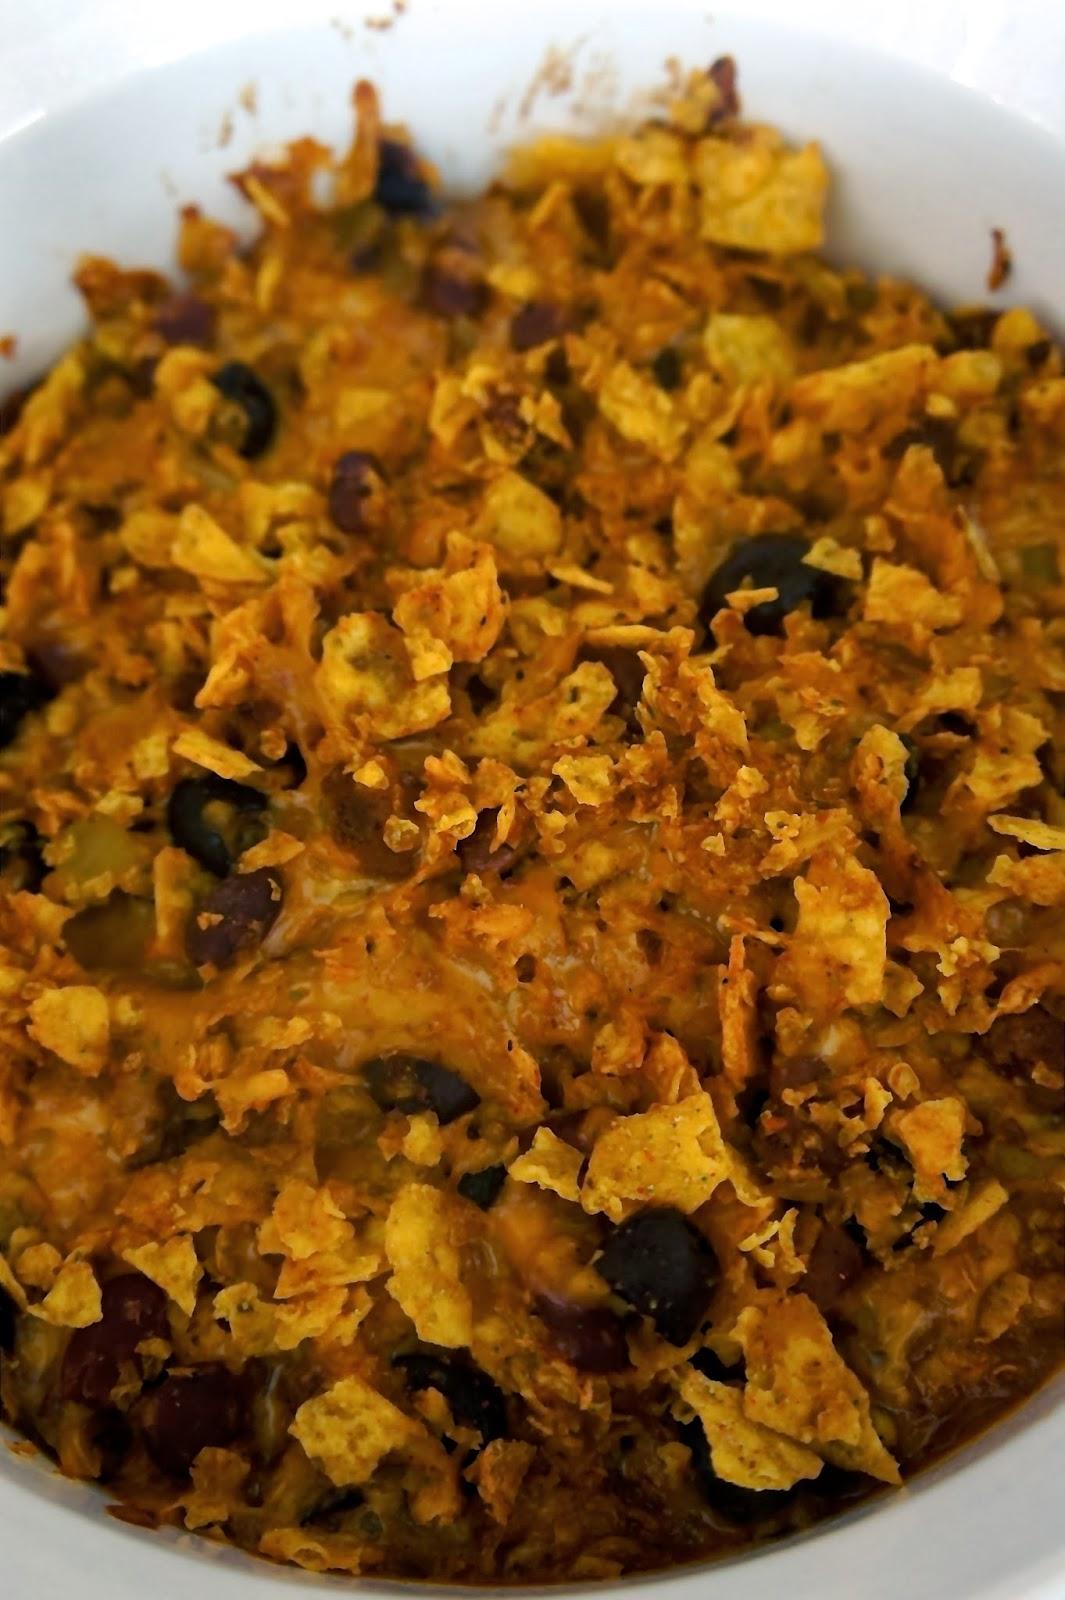 Savory Sweet and Satisfying: Chili Casserole